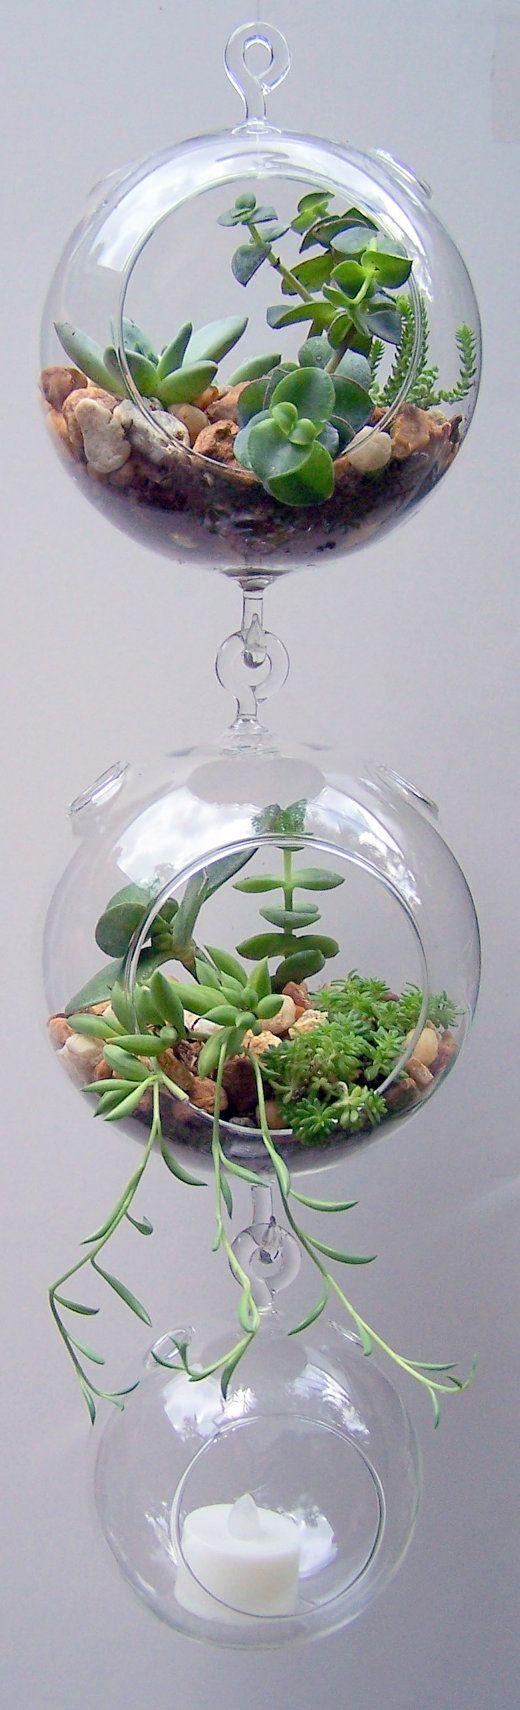 Inspiration Deco Le Terrarium Femina Crea Jay Concept